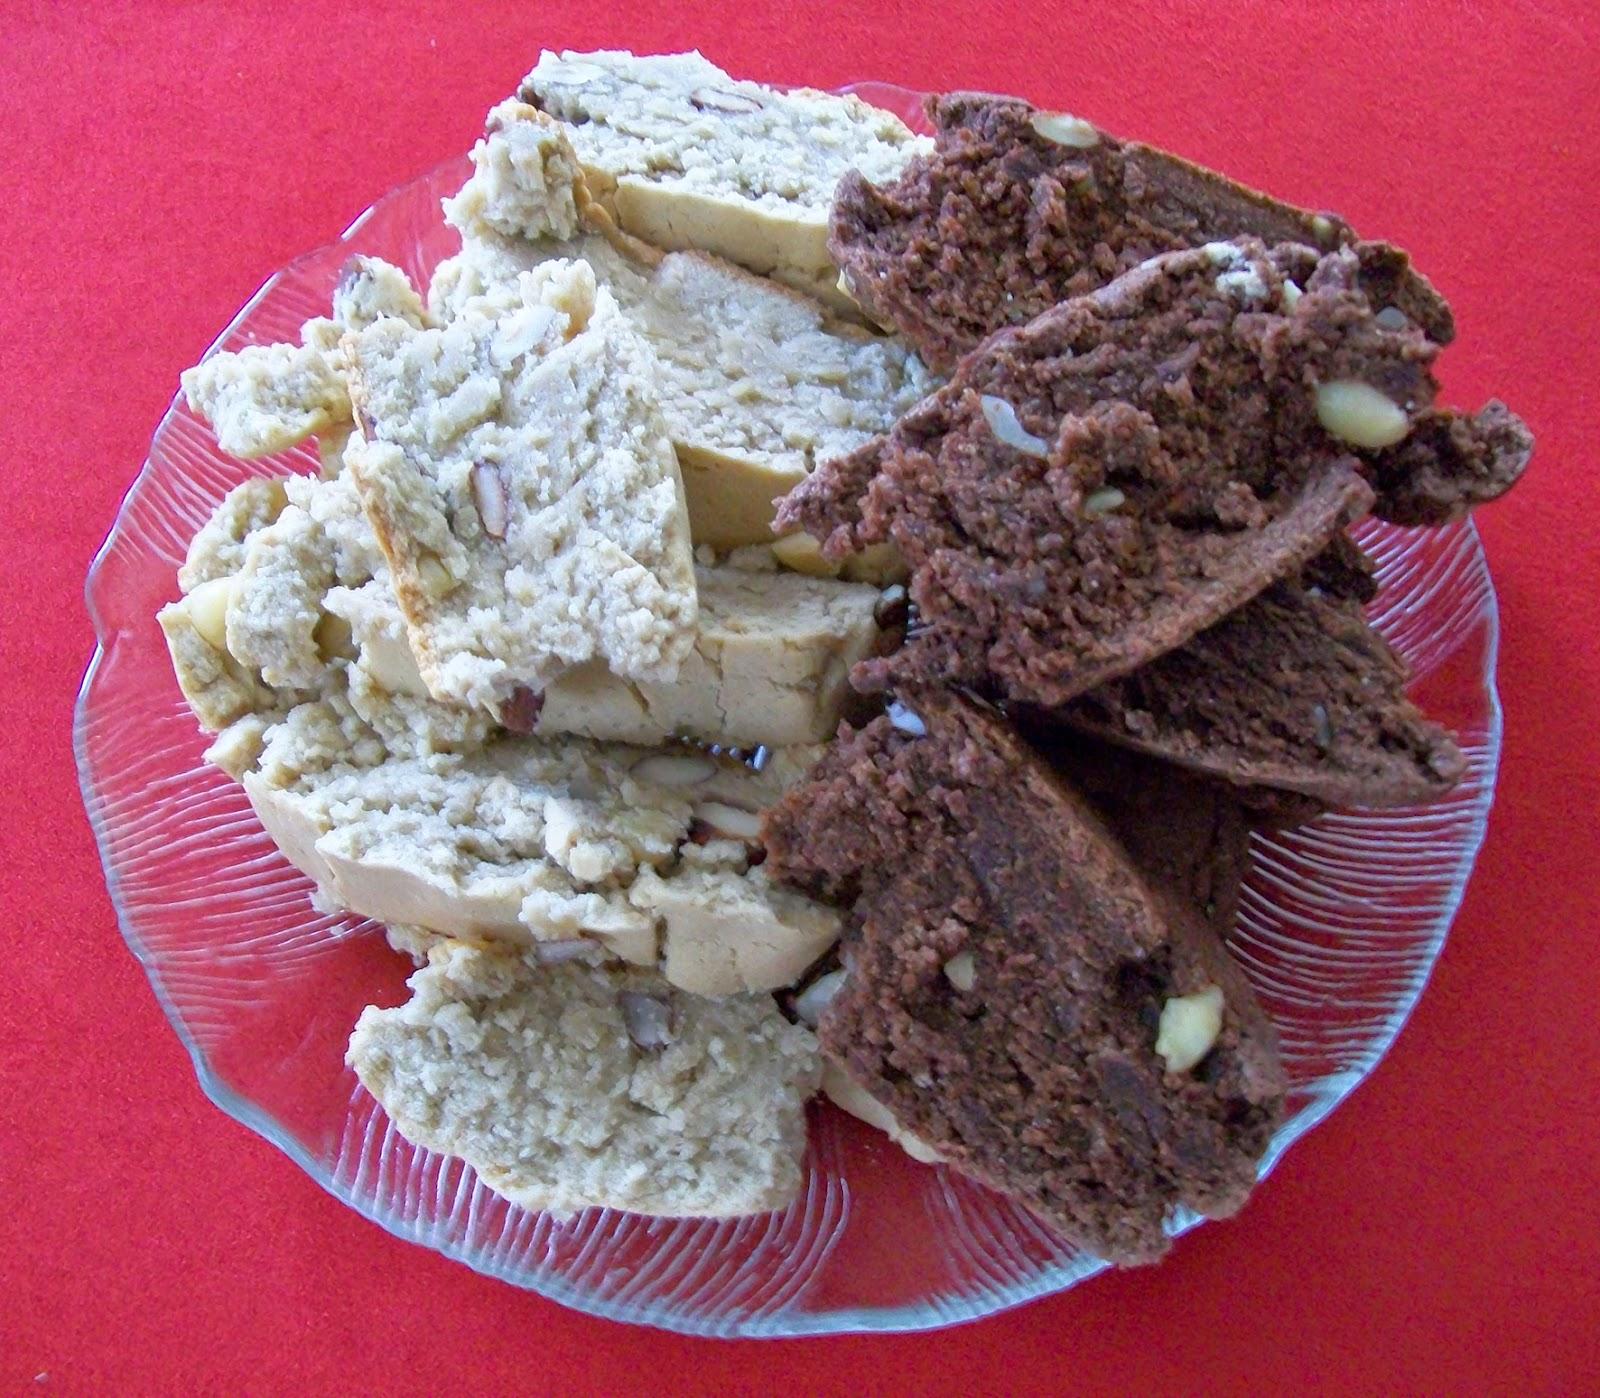 vegan essen in wien - Vegane Biscotti - alt. mit Stevia - Italien - kekse